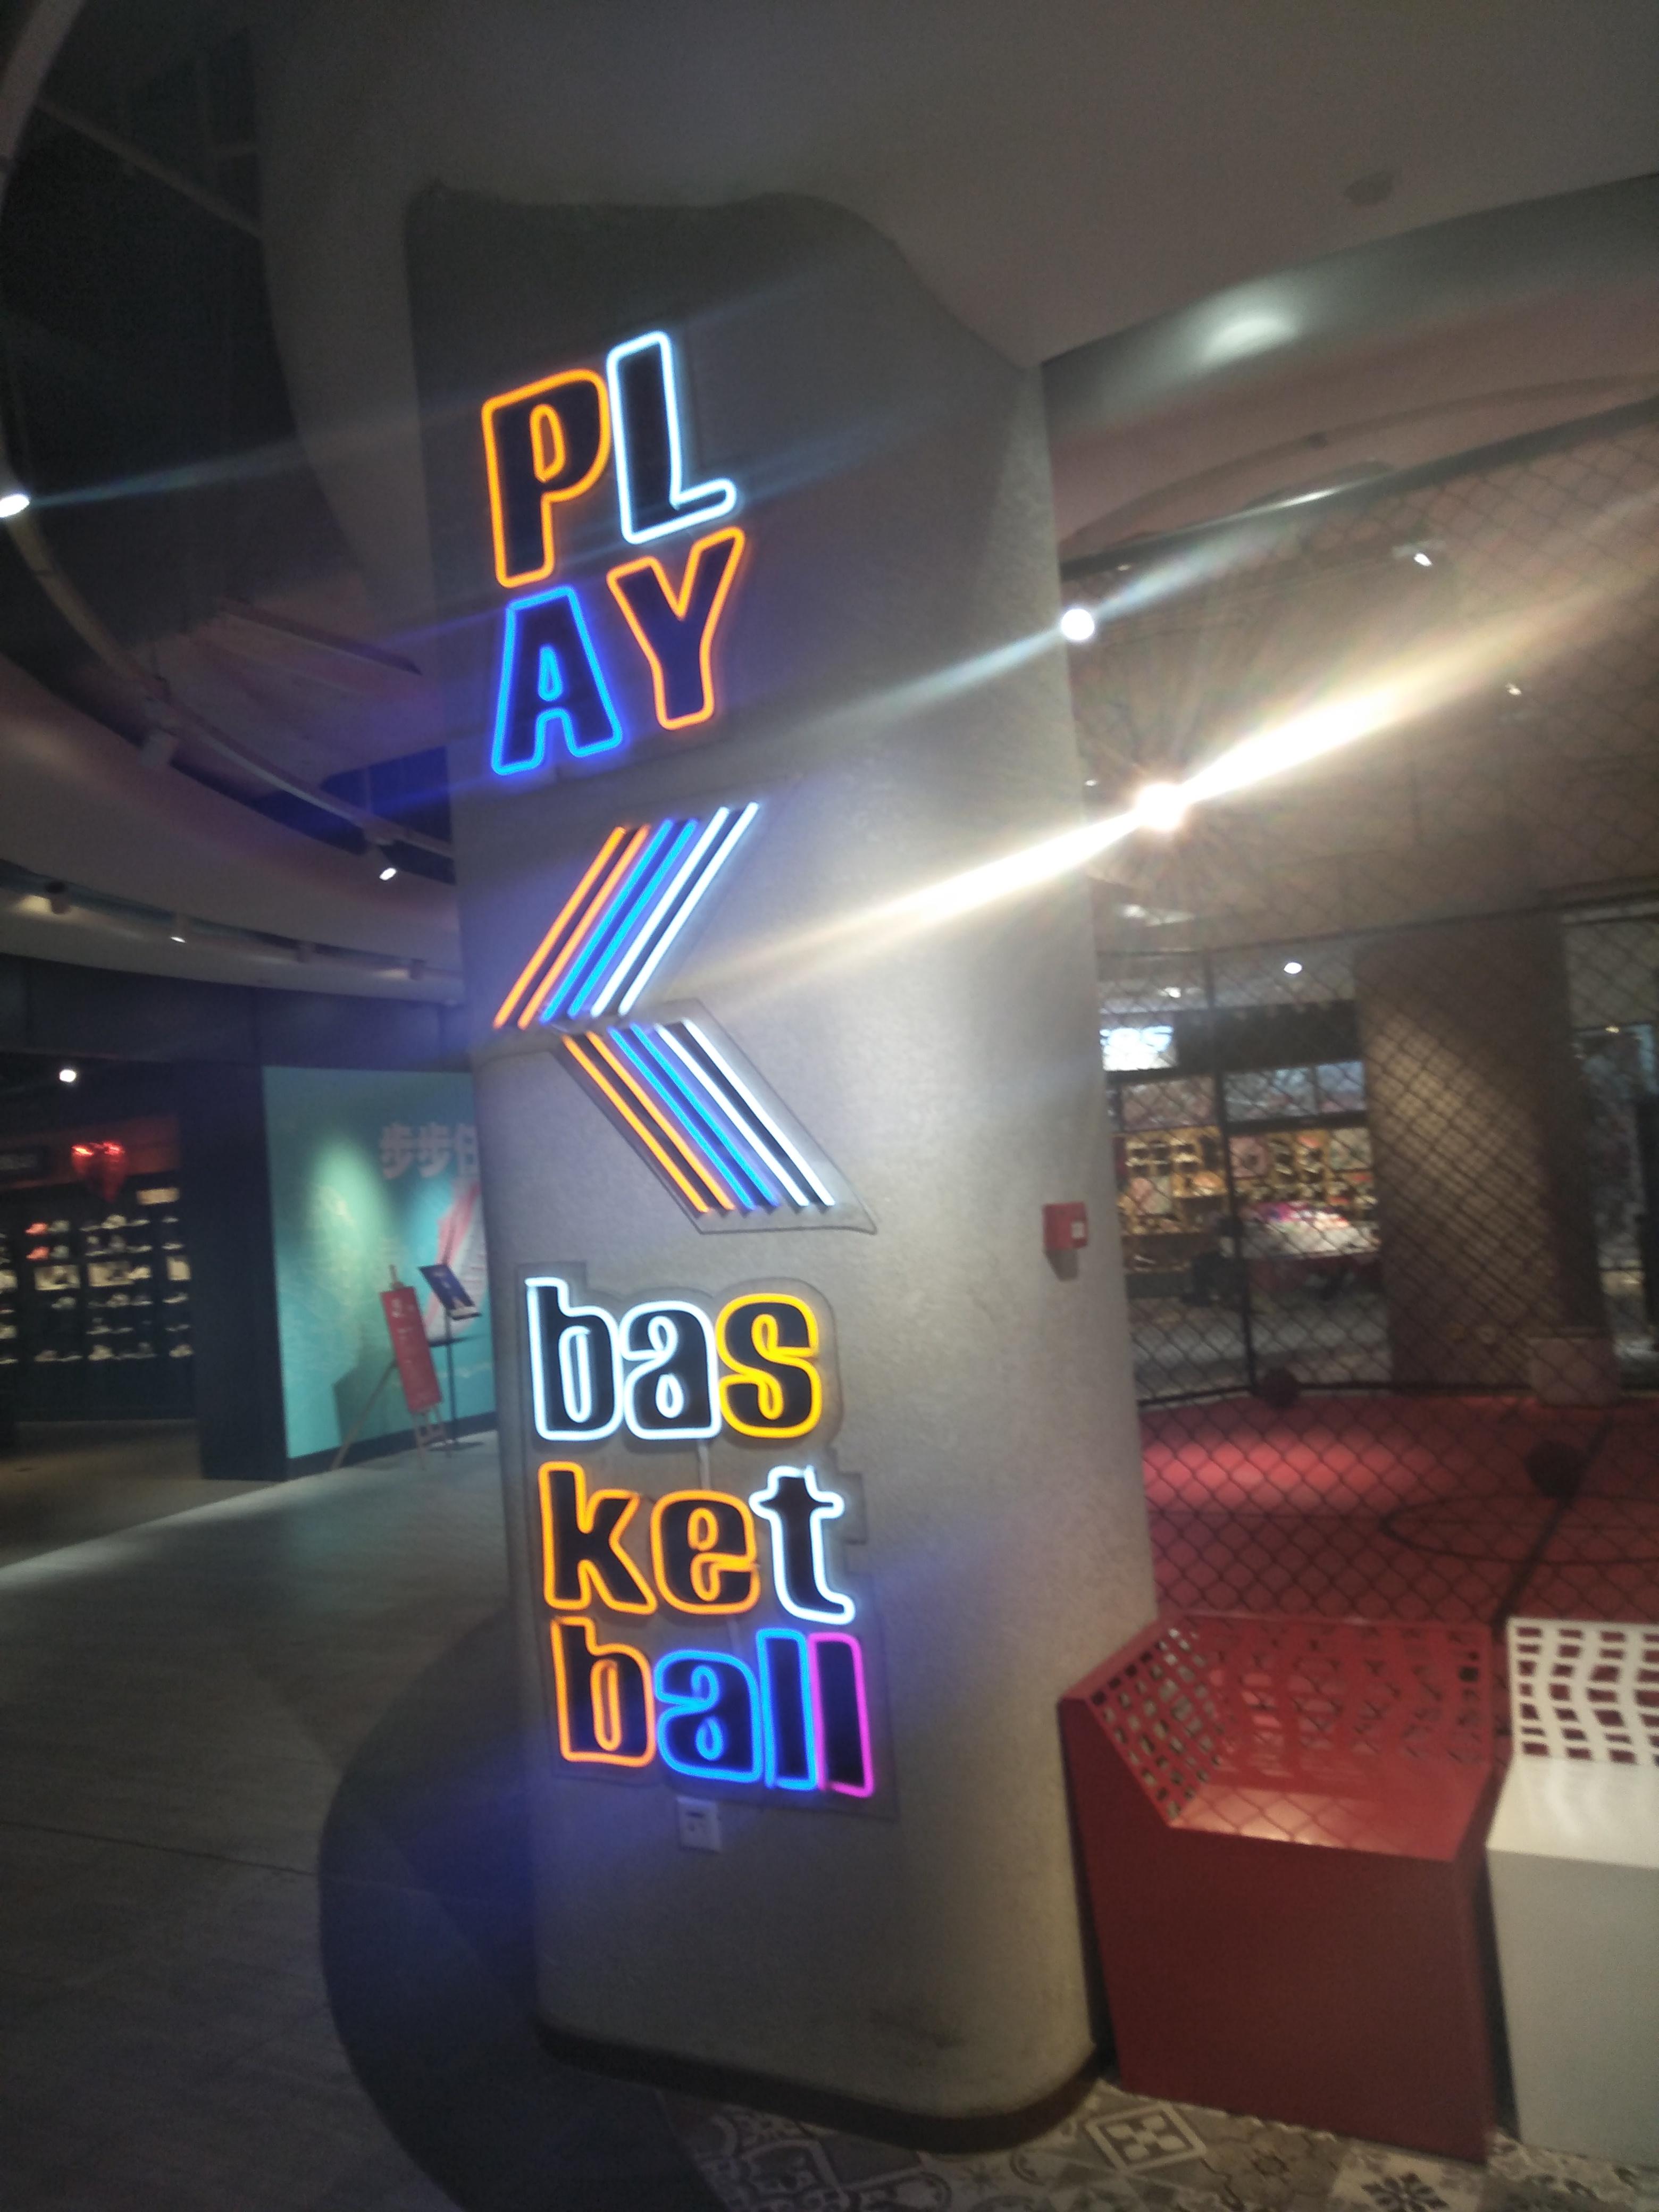 PLAYbasketball